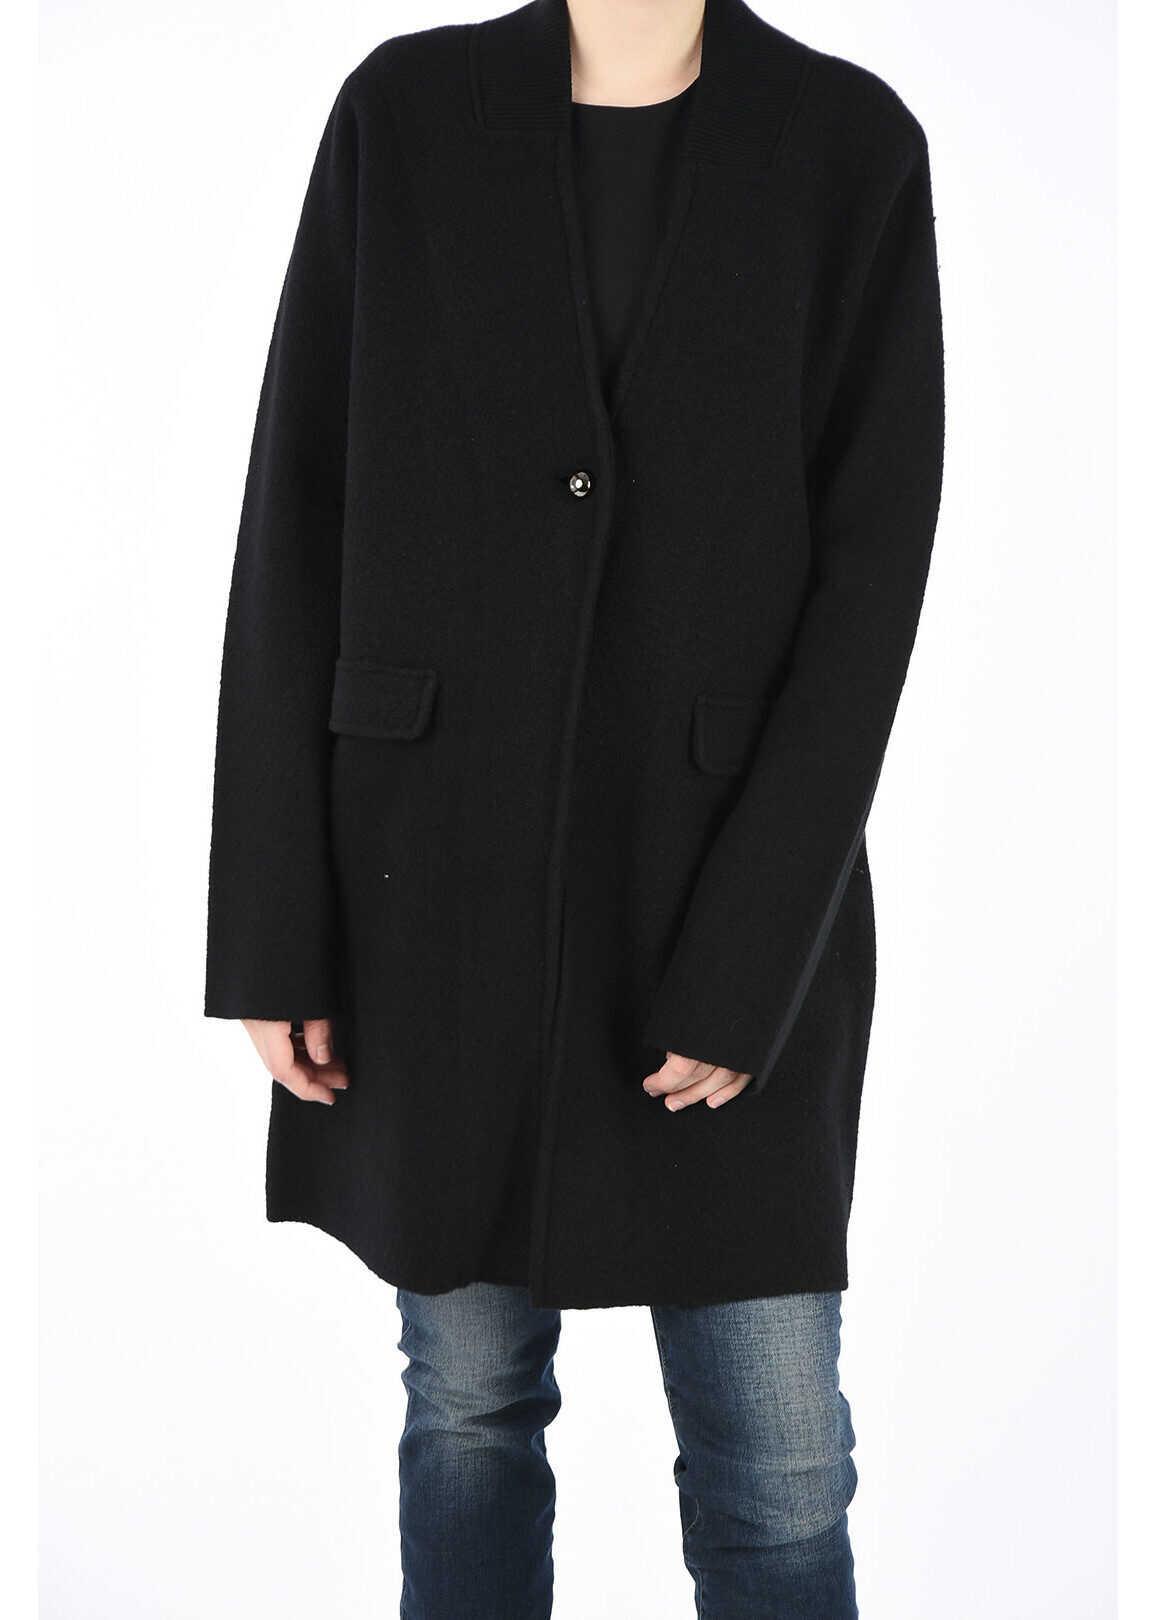 Armani ARMANI JEANS Wool Coat BLACK